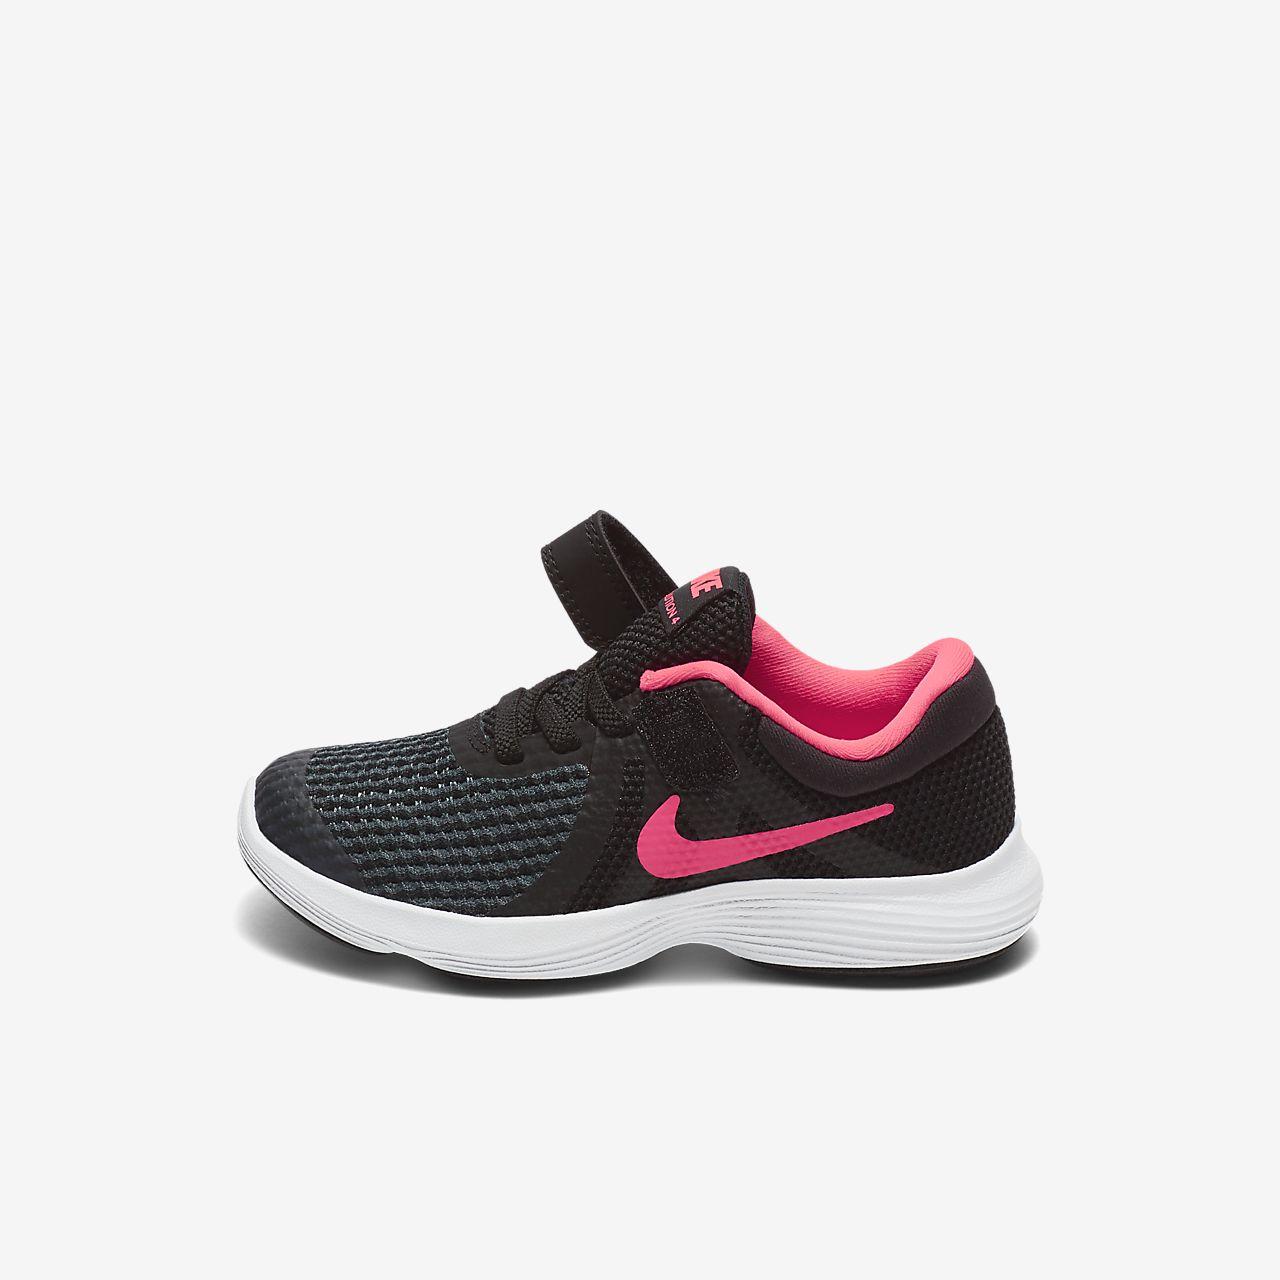 reputable site b3b8b b7e47 ... Nike Revolution 4 Küçük Çocuk Ayakkabısı